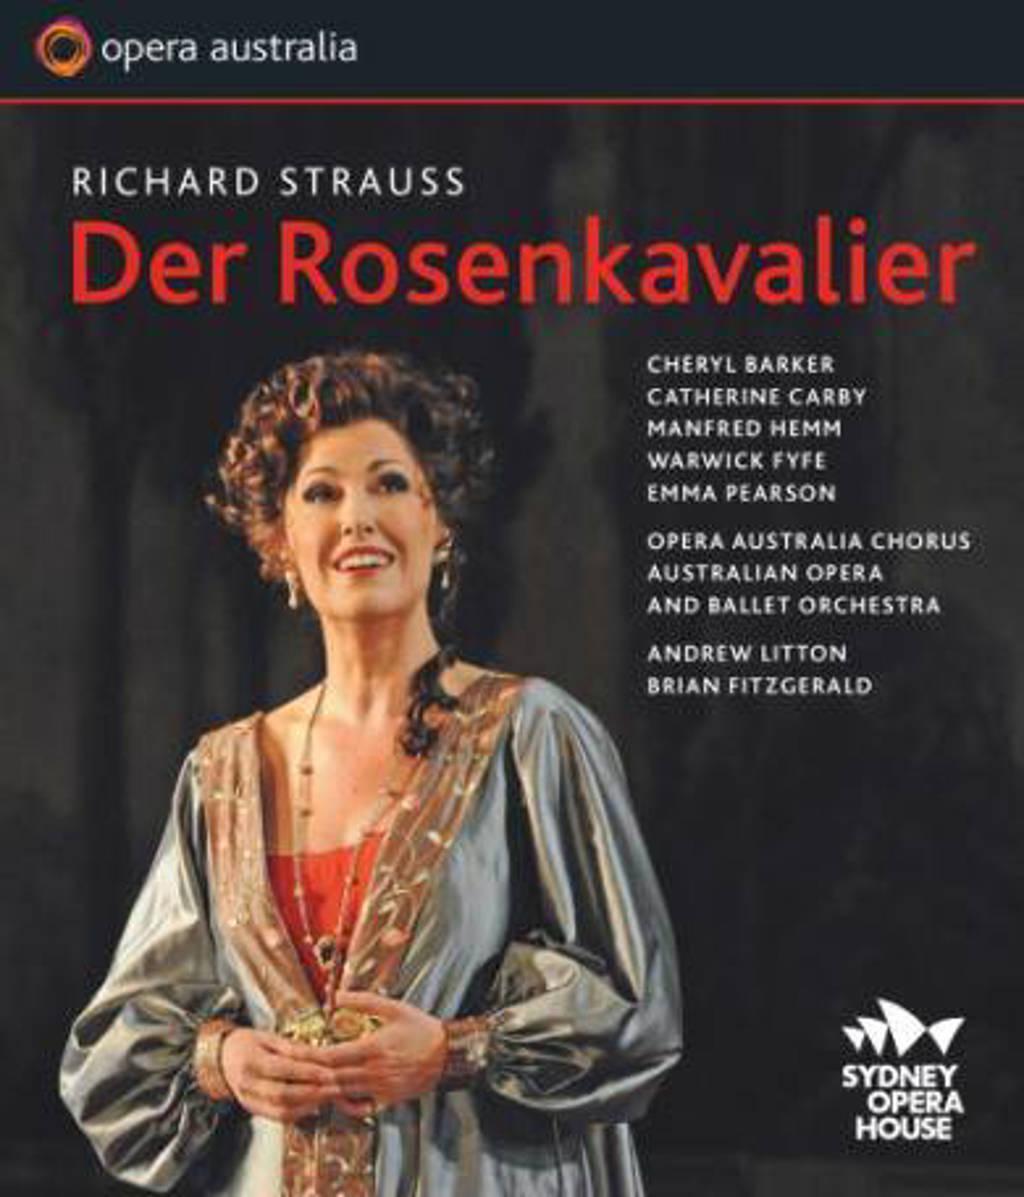 Barker, Carby,Pearson,Hemm - Der Rosenkavalier, Sydney 2011, Br (Blu-ray)